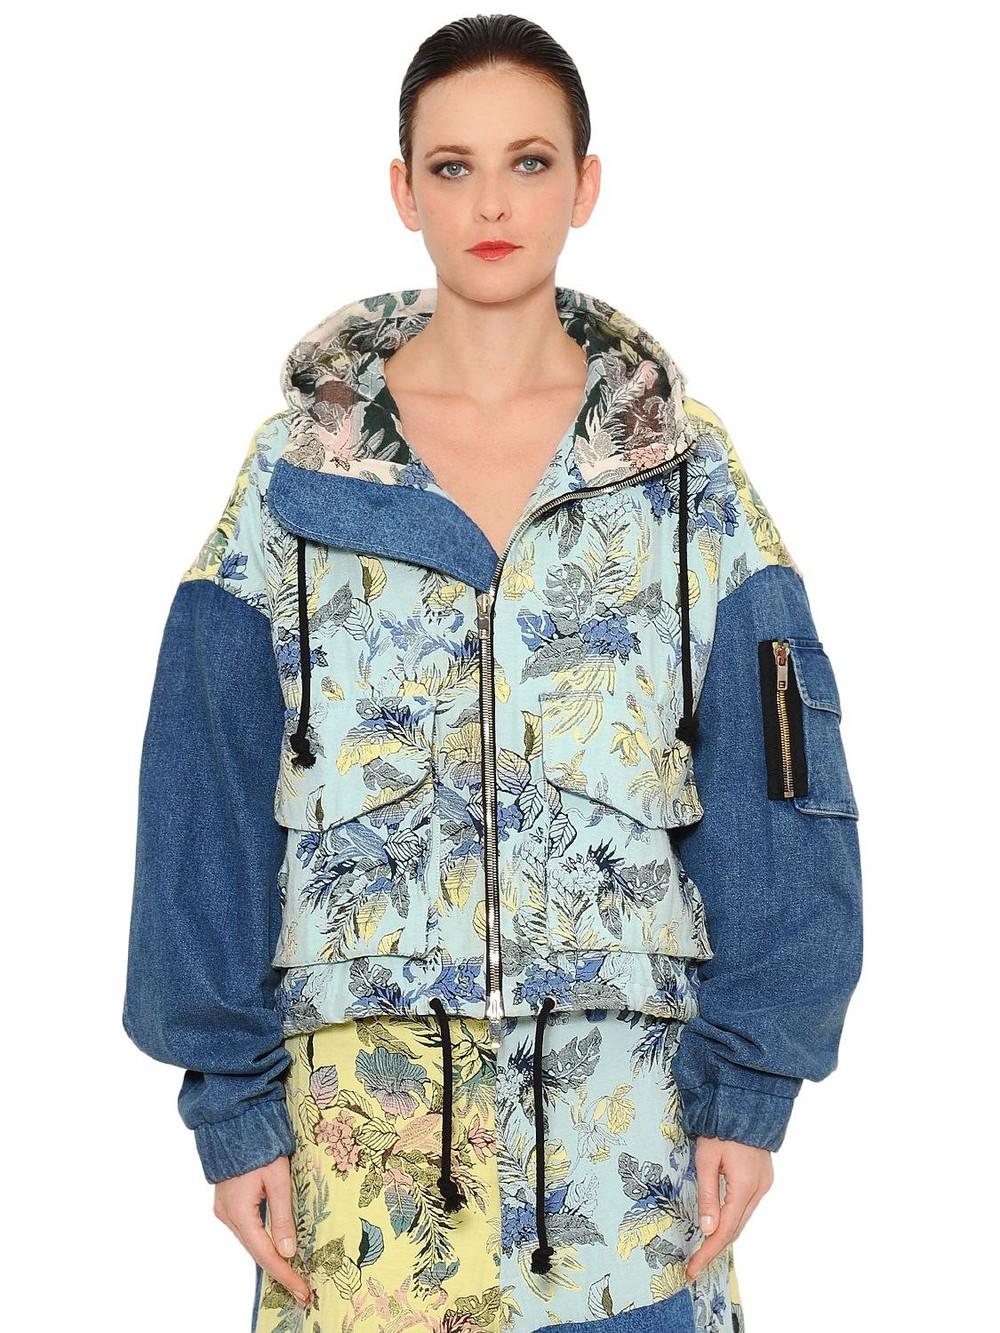 MARNA RO Brocade & Denim Patchwork Bomber Jacket in blue / multi